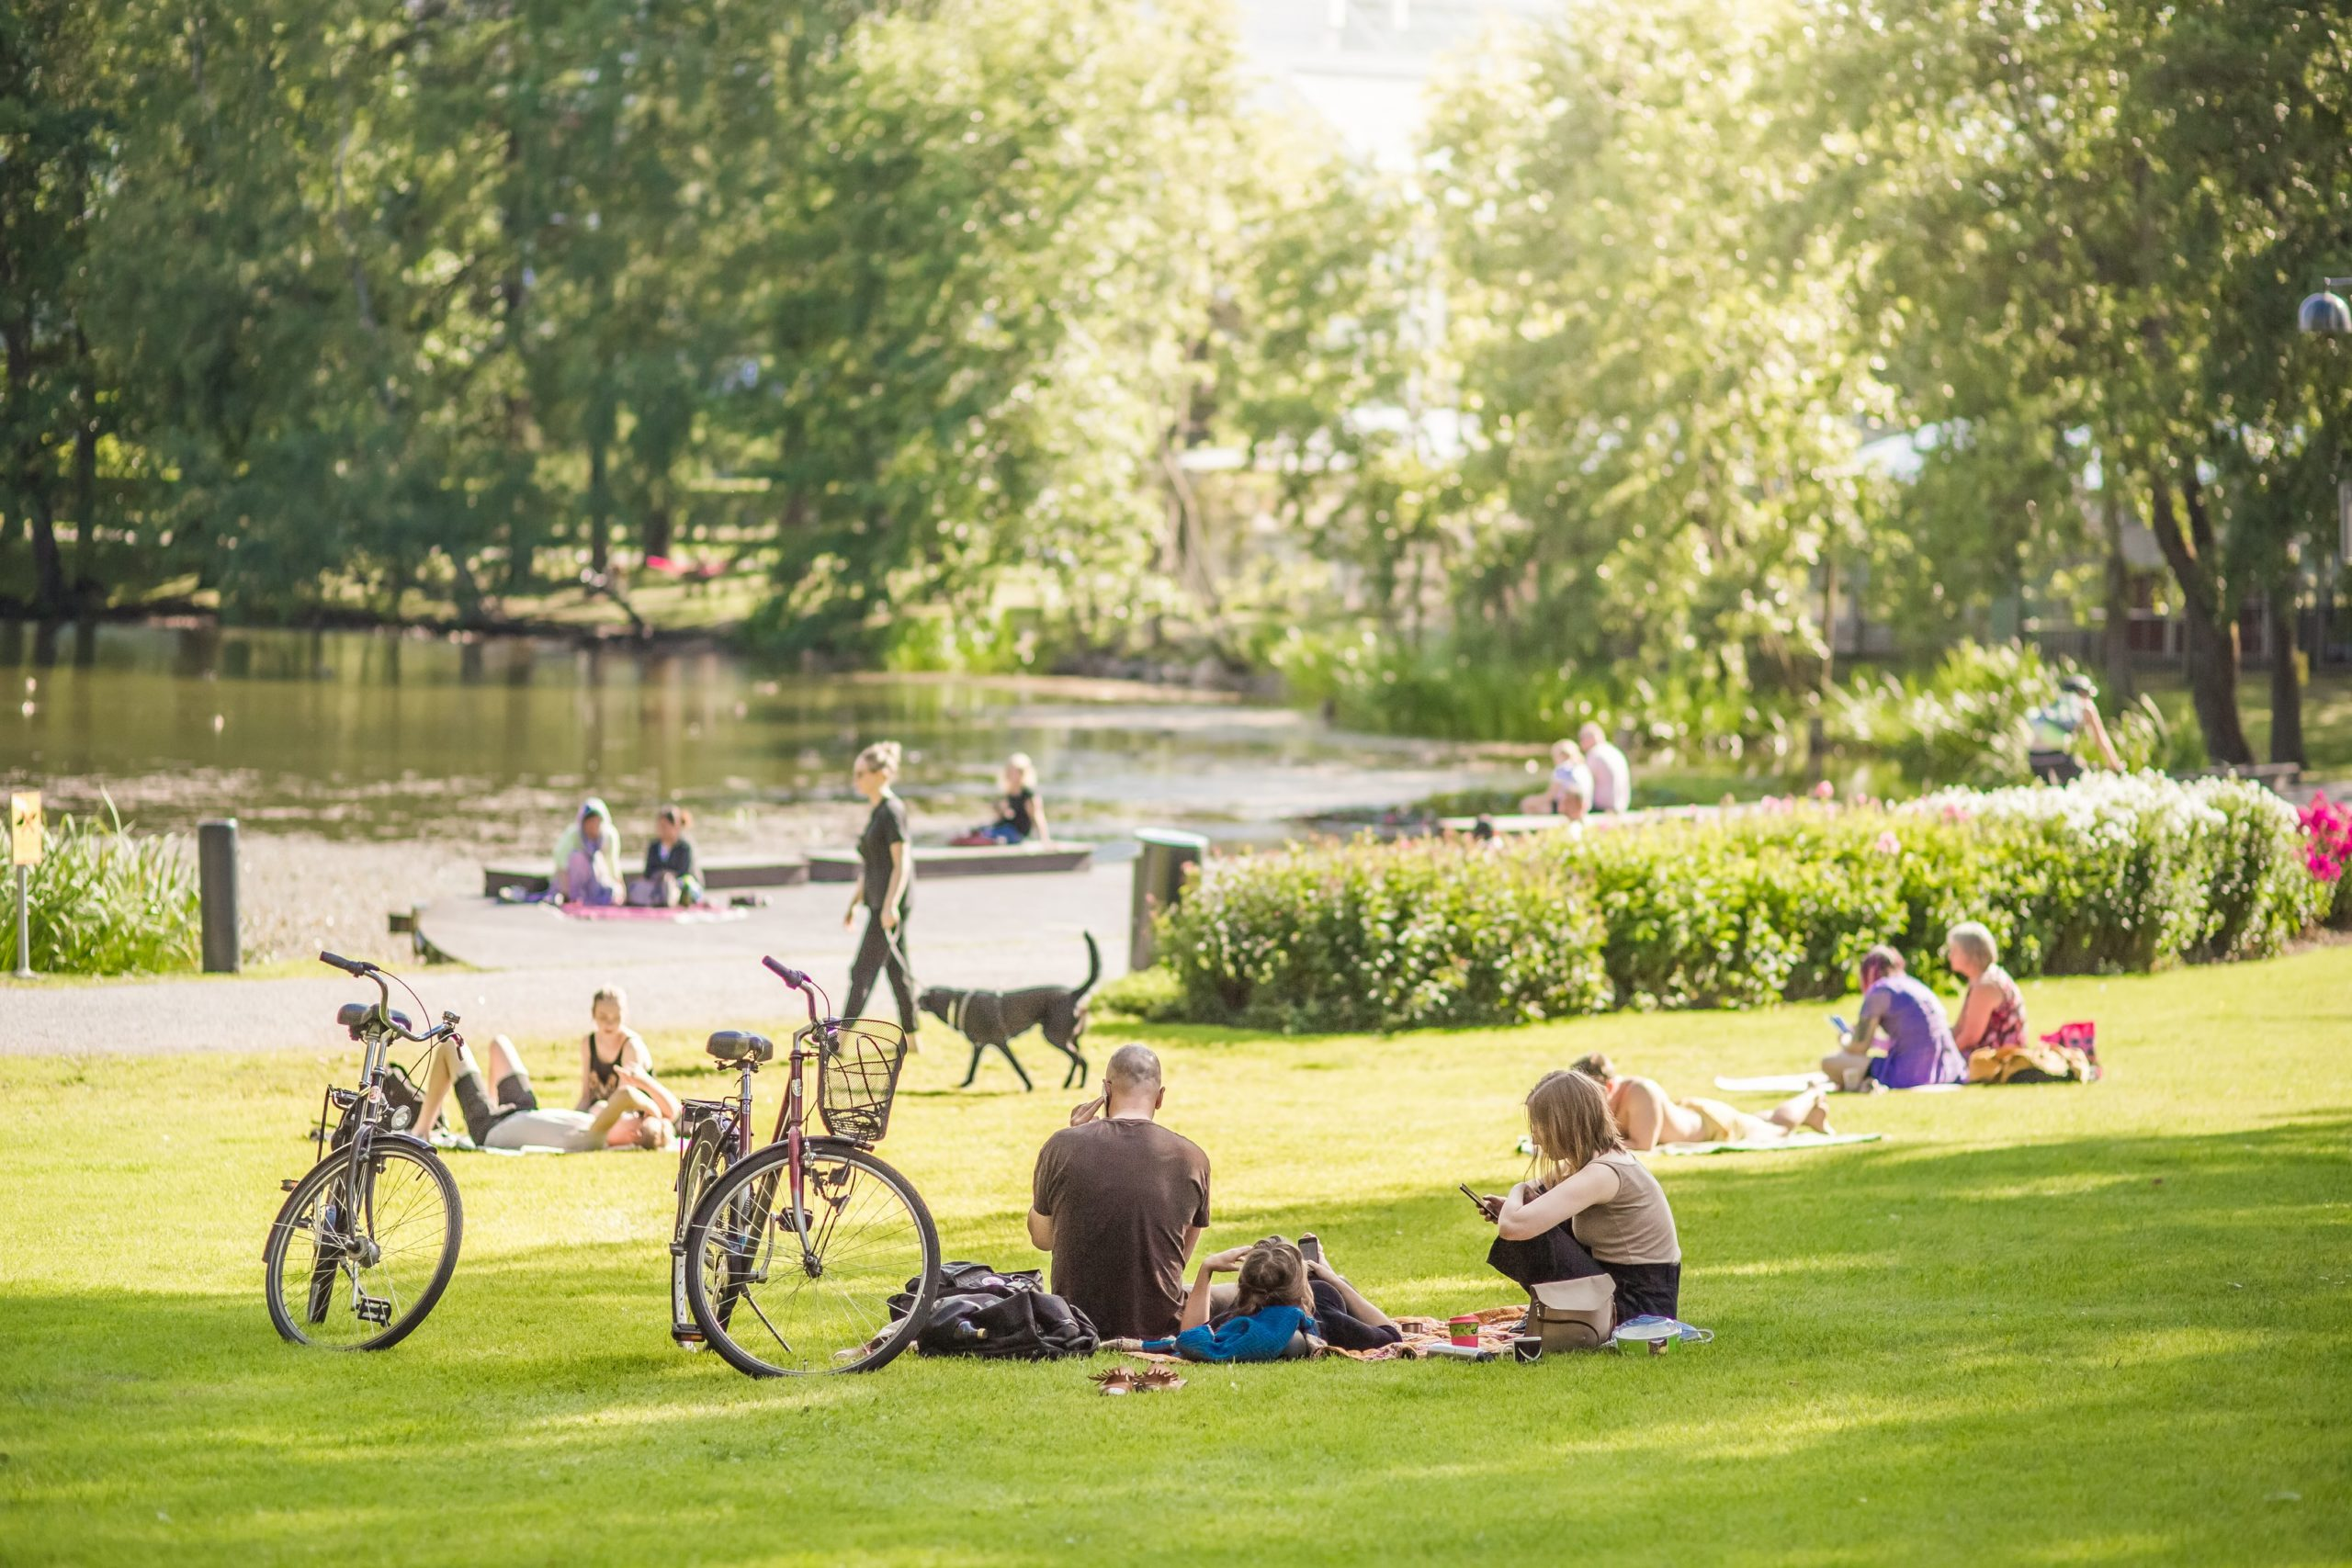 Visit Tampere Tampereen Kaupunki Sorsapuisto park Summer 2019 Laura Vanzo 13